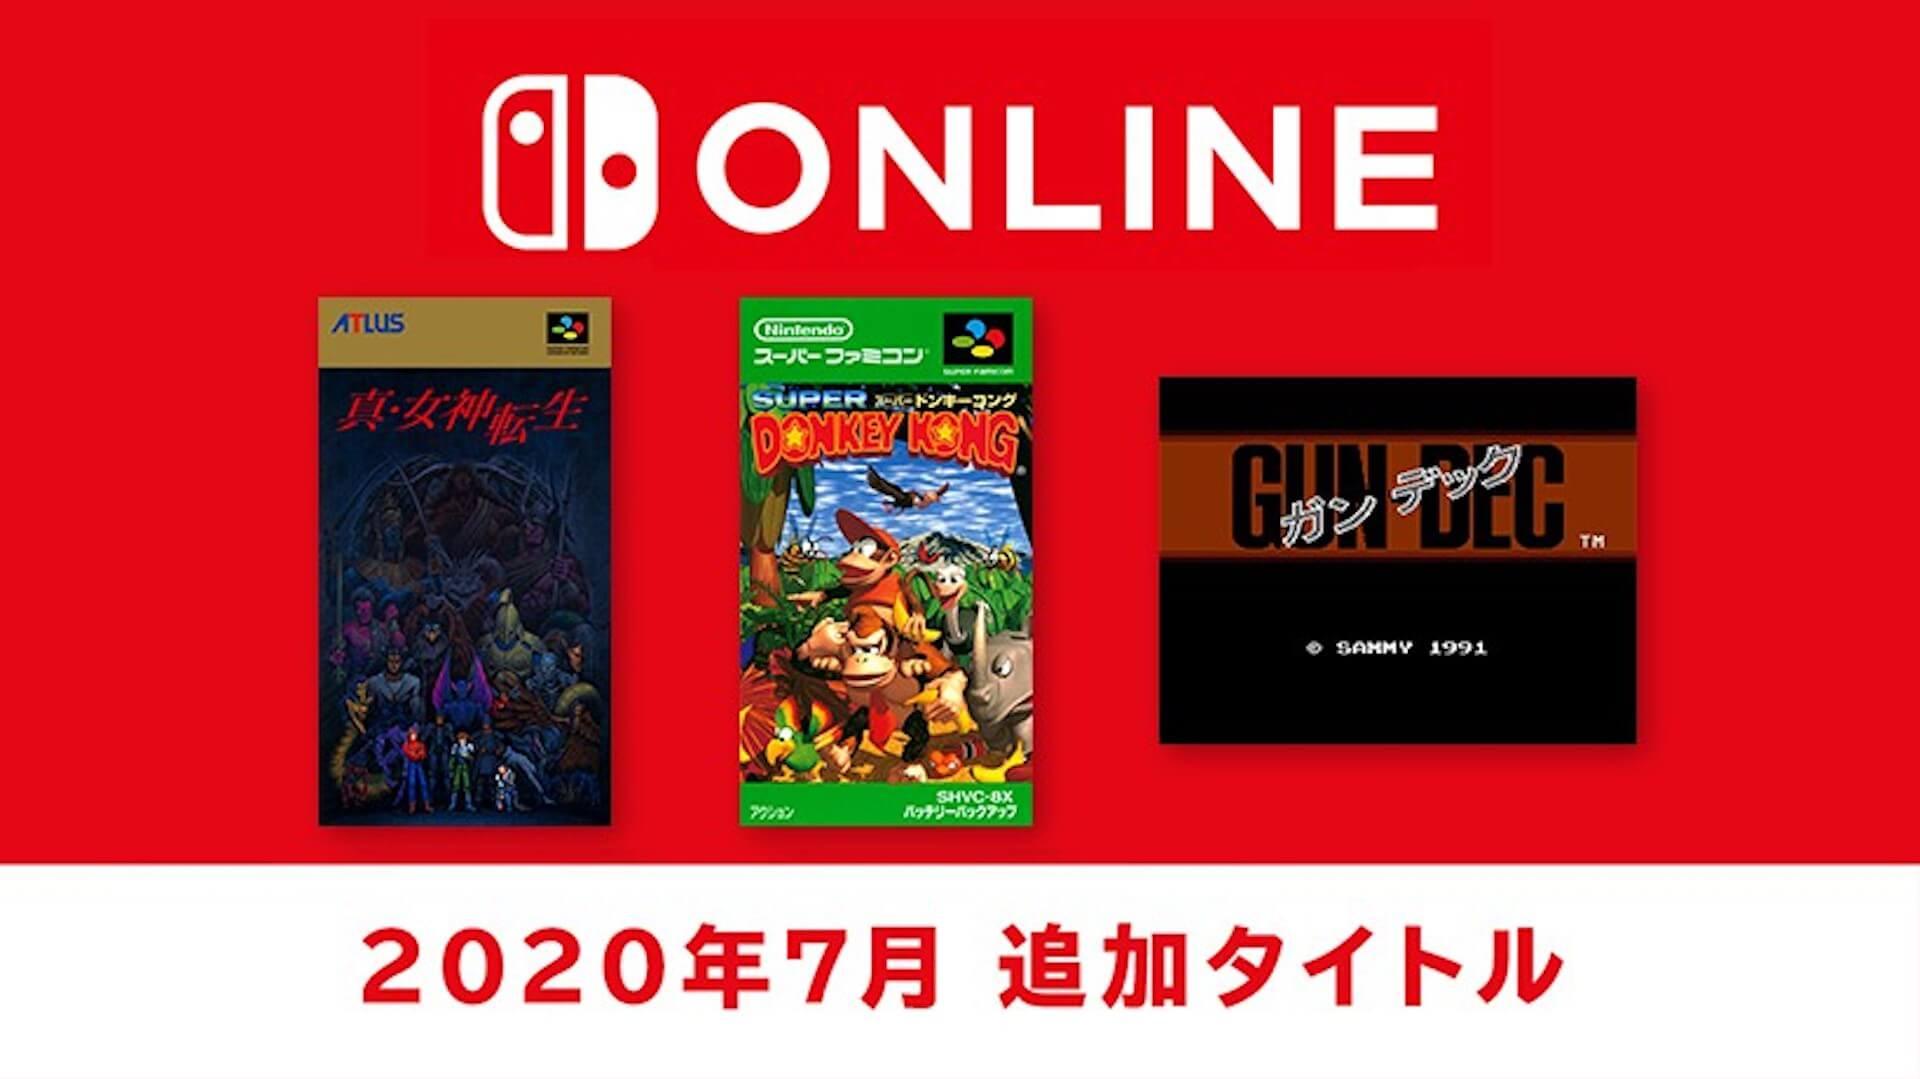 Nintendo Switch Onlineのスーファミ&ファミコンタイトルに『スーパードンキーコング』『真・女神転生』『ガンデック』の3タイトルが追加! tech200708_nintendoswitch_1